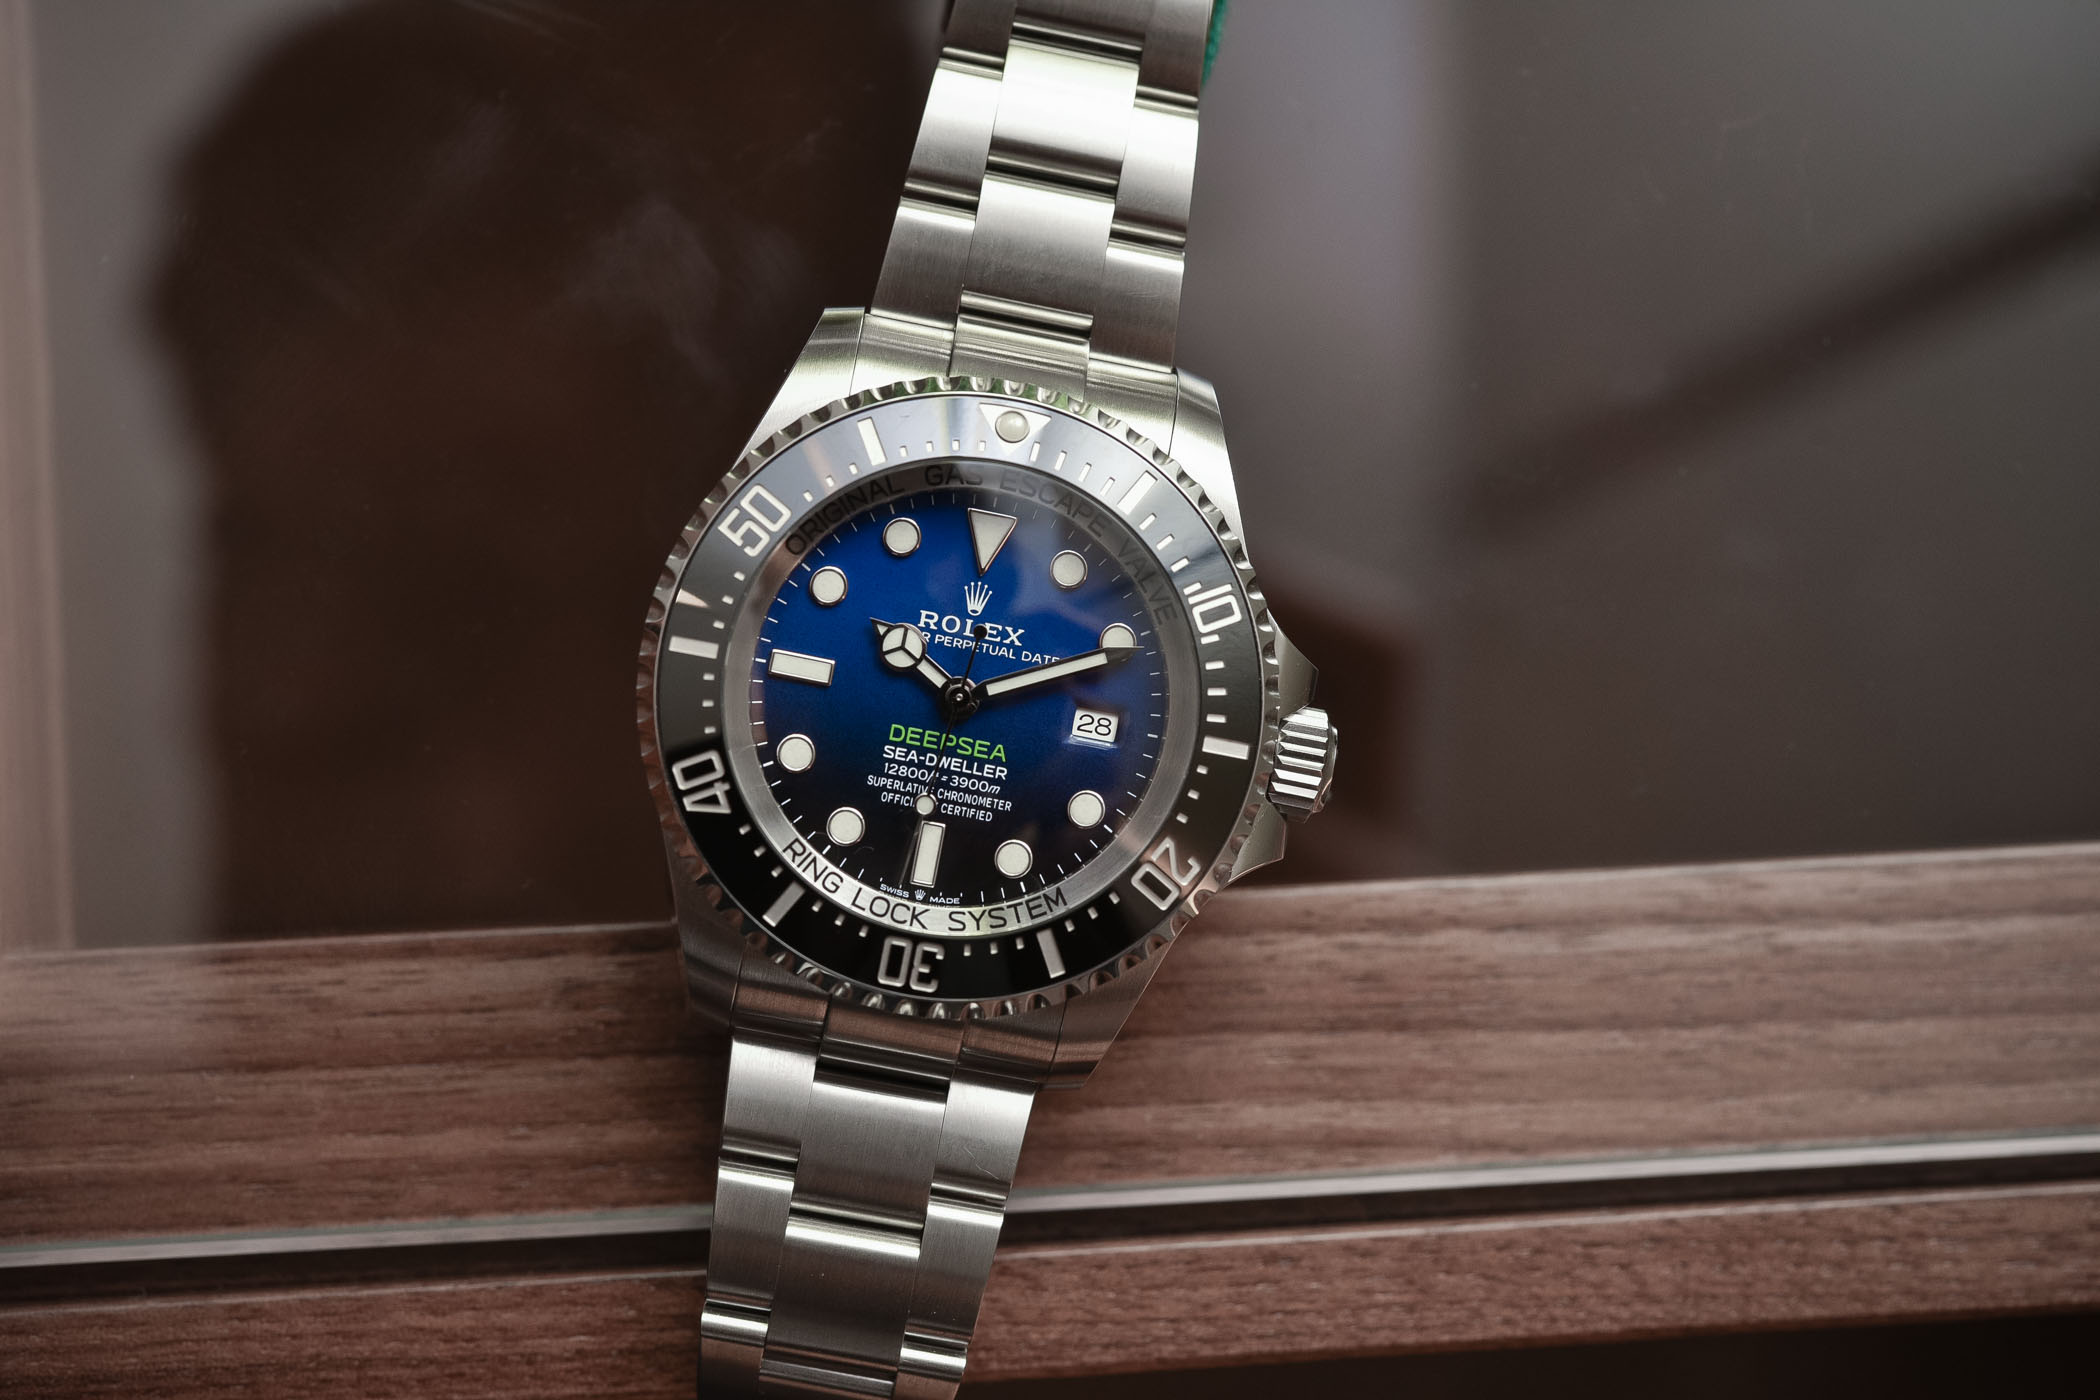 Hands On Rolex Deepsea Ref 126660 Baselworld 2018